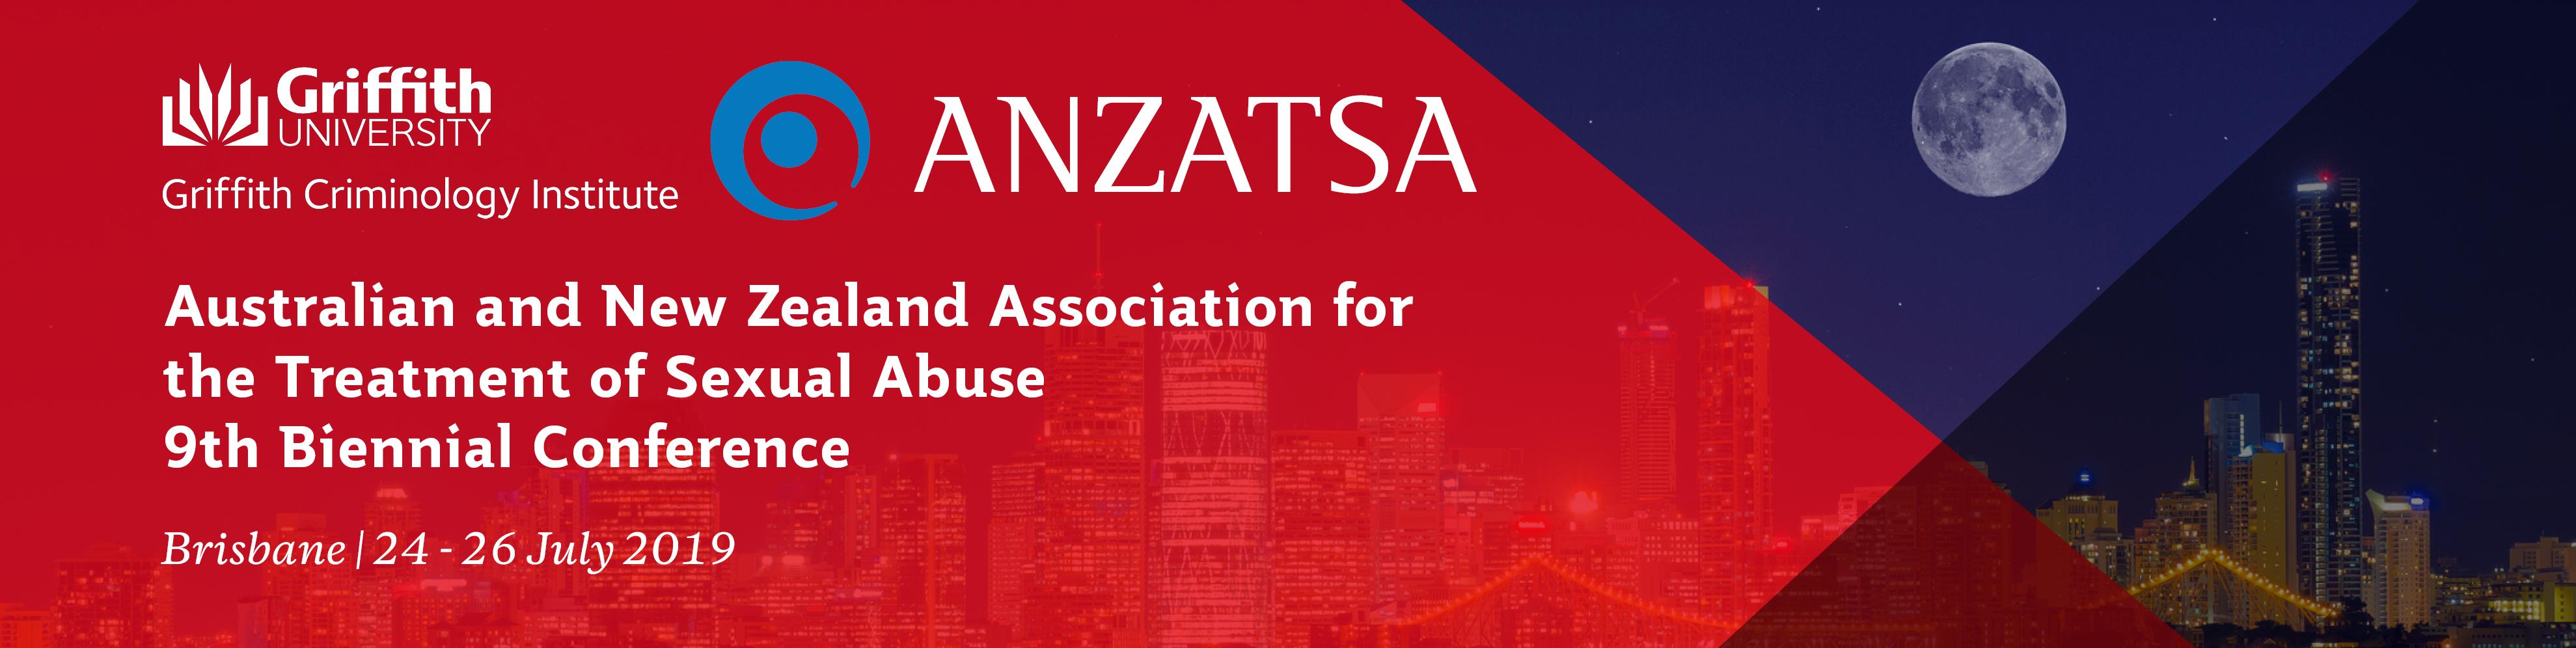 ANZATSA Conference 2019